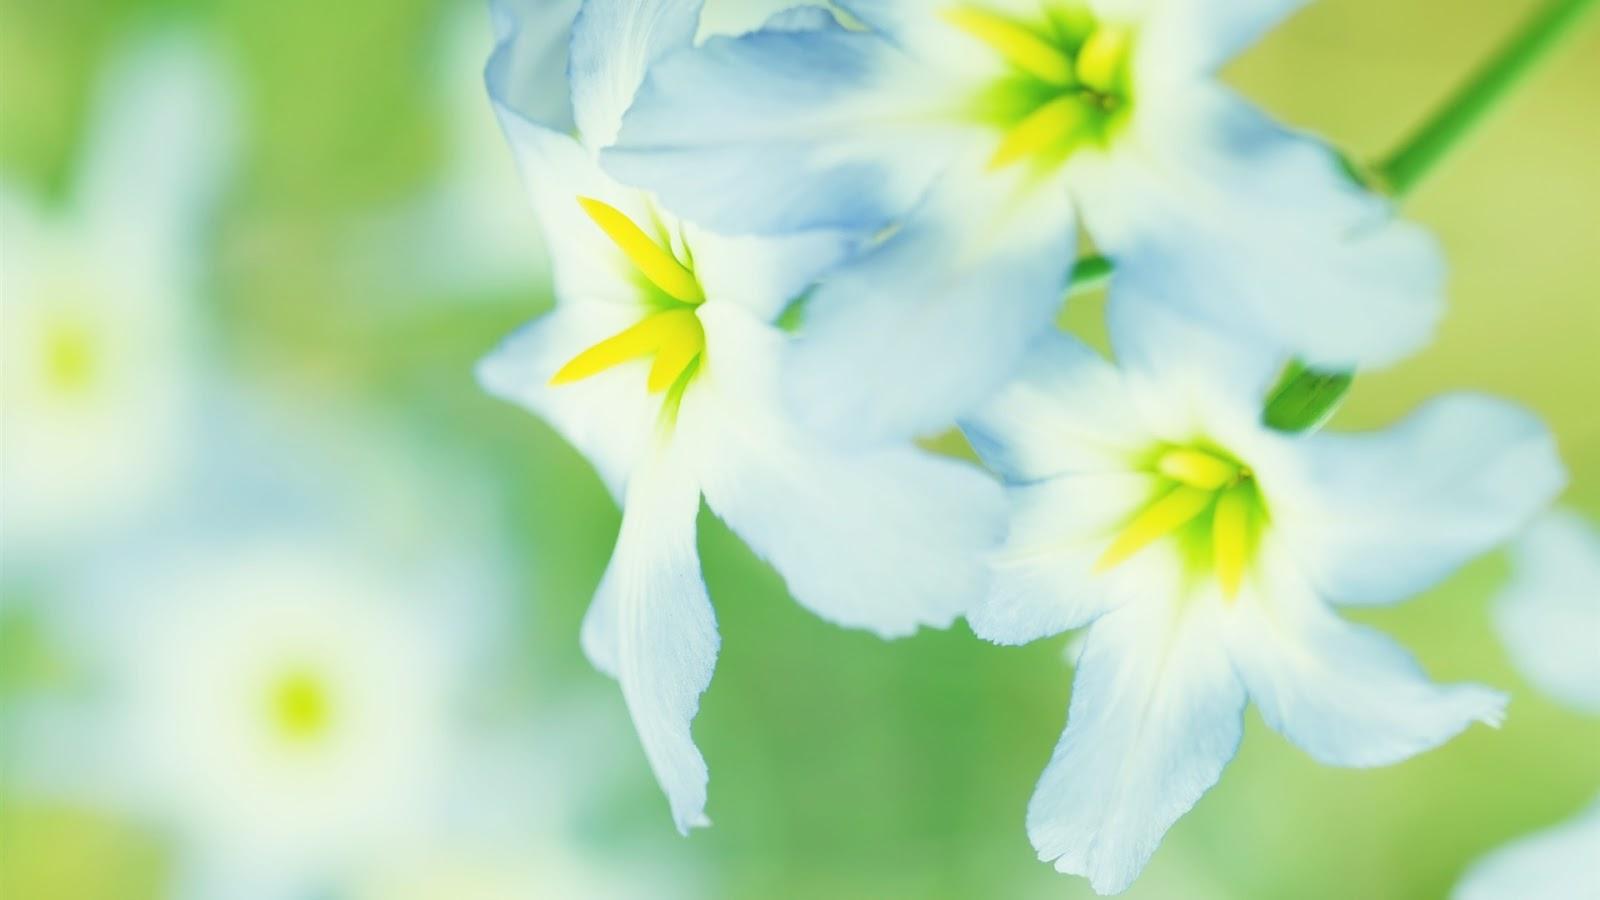 http://3.bp.blogspot.com/-0BPqOFjFvug/T9GVyZyf1vI/AAAAAAAAD-c/B3wI8fexqoY/s1600/Bloom+Flower+Wallpaper+3.jpg